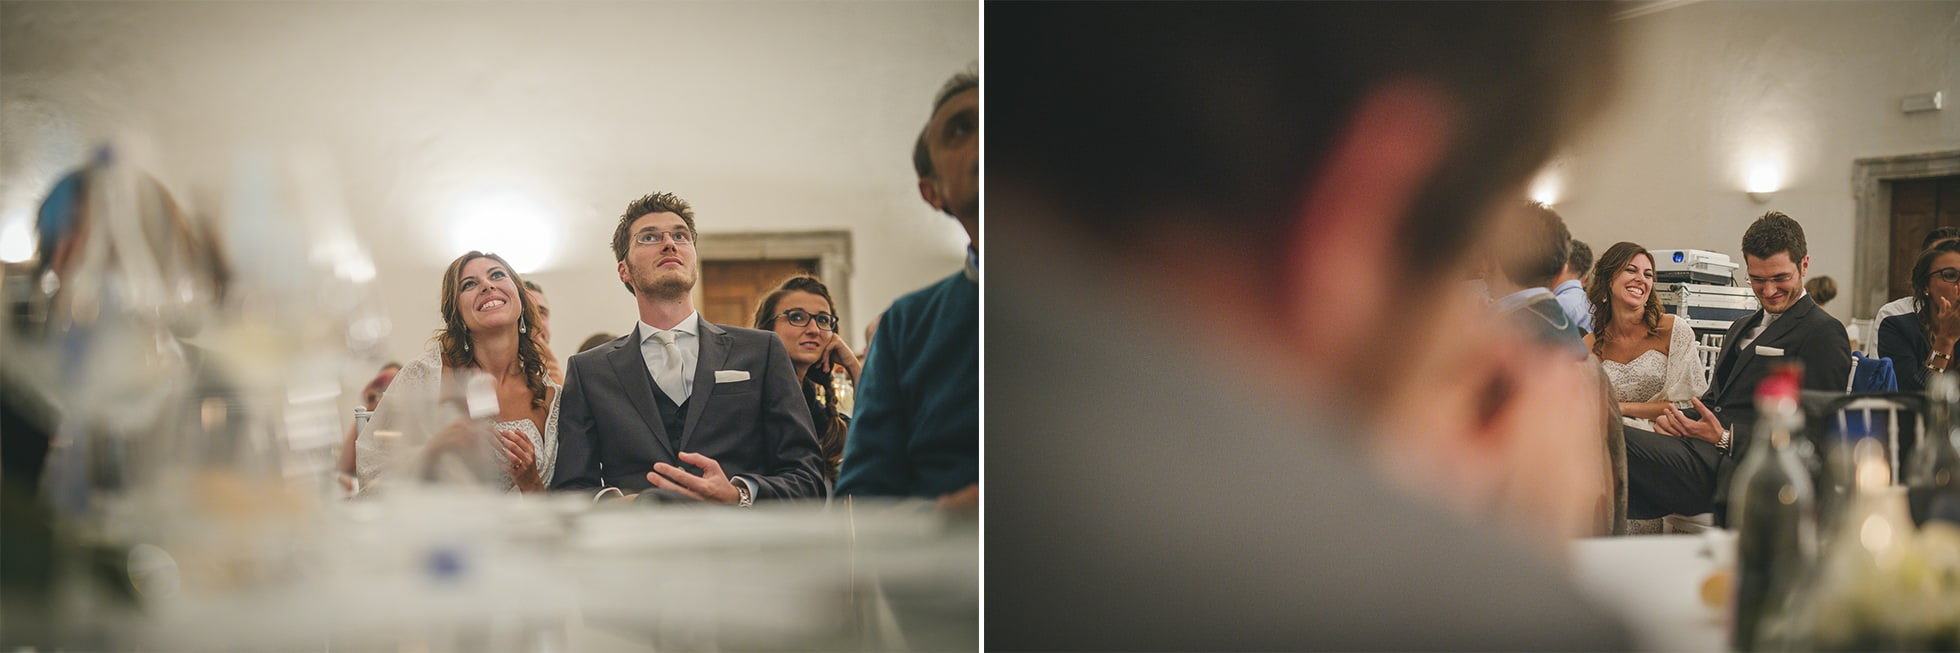 Fotografo matrimonio gravedona